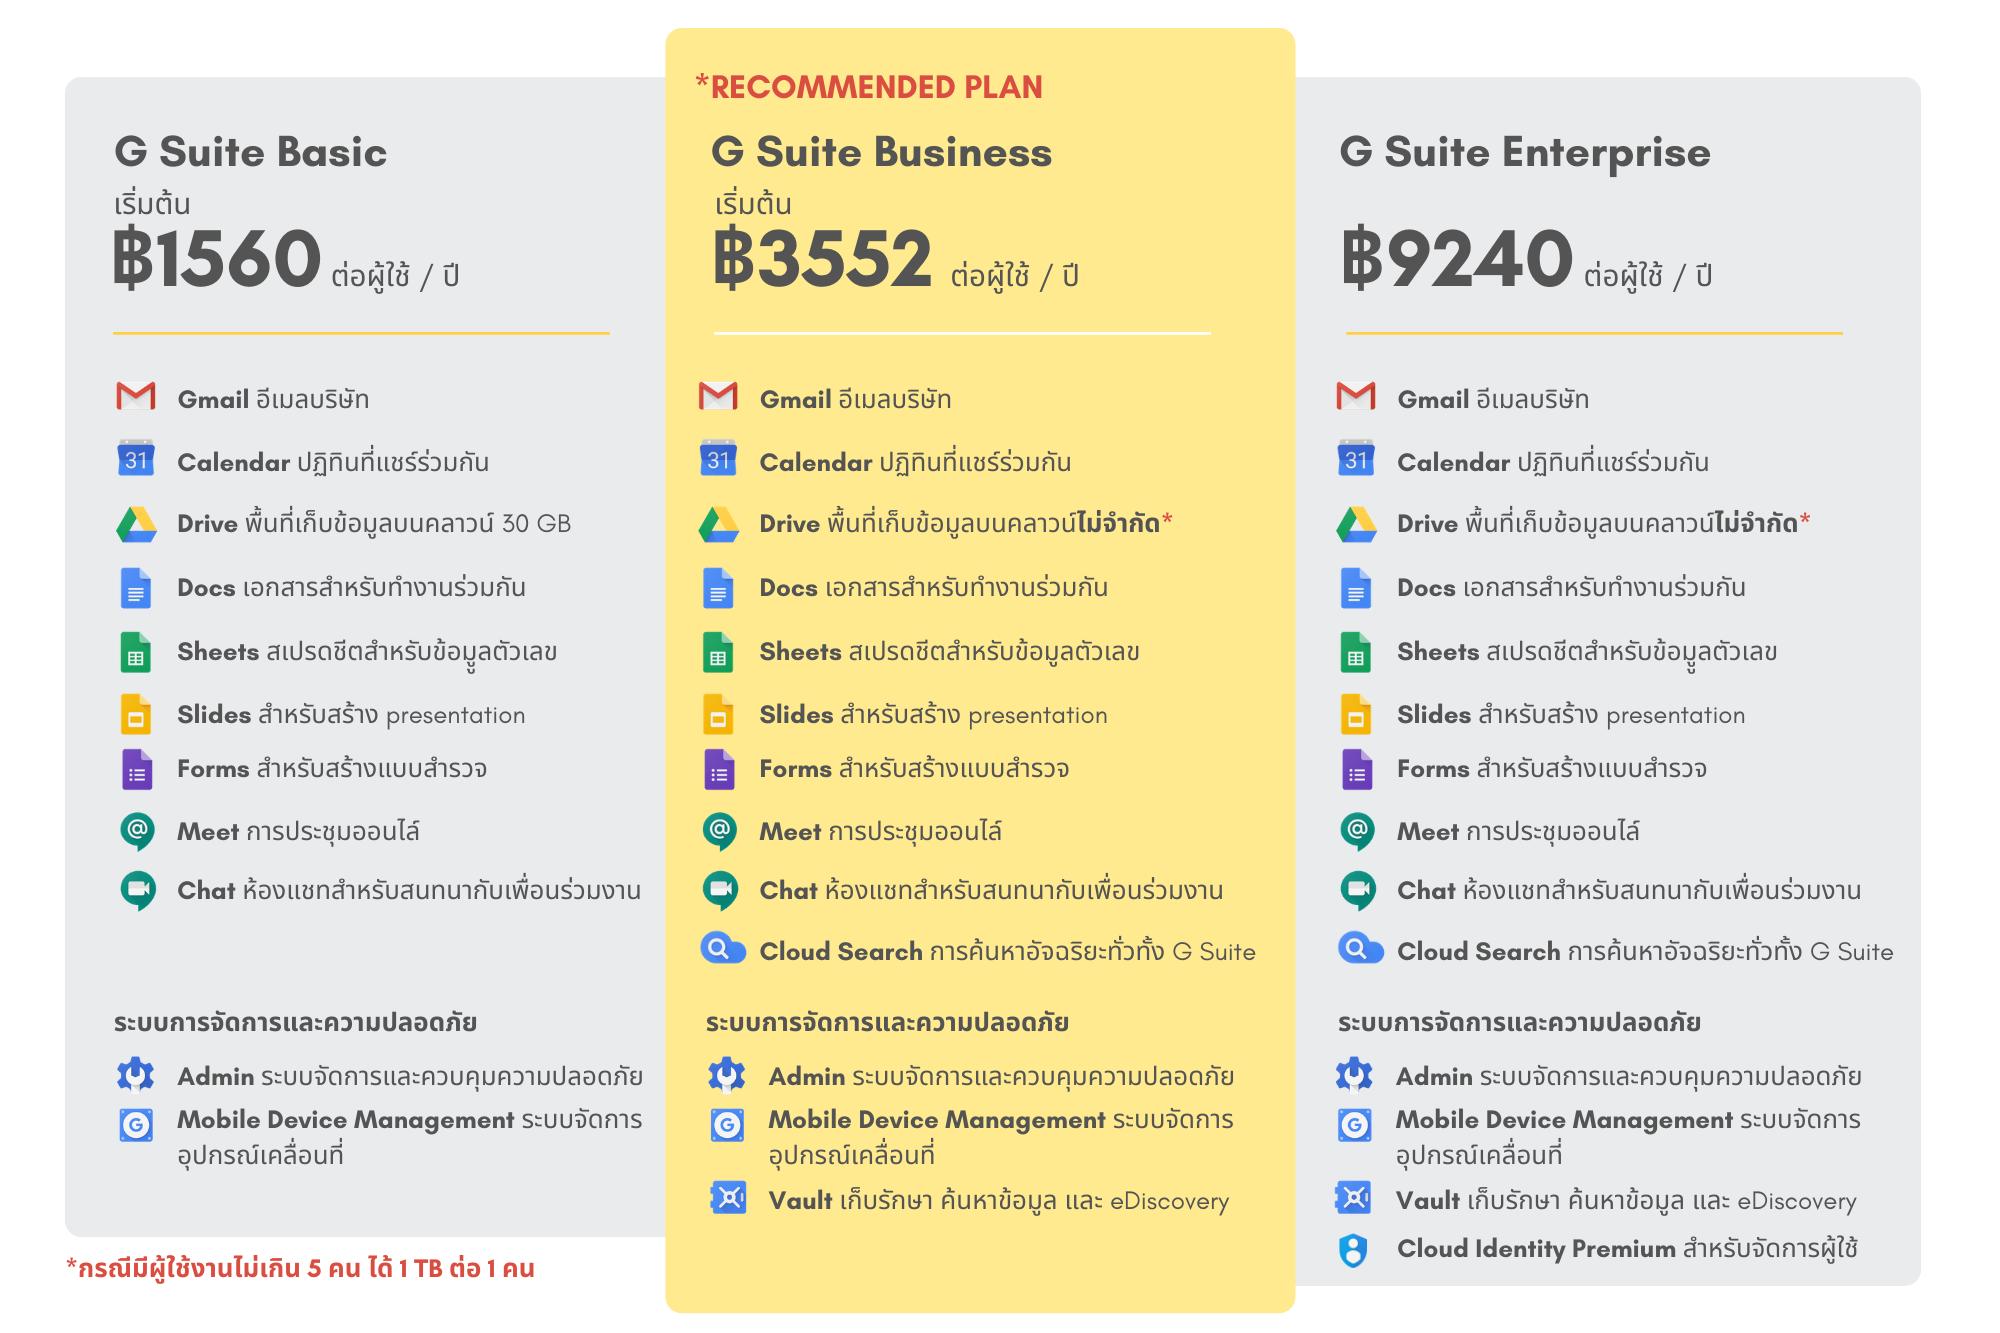 G Suite price comparison chart _ TH-1